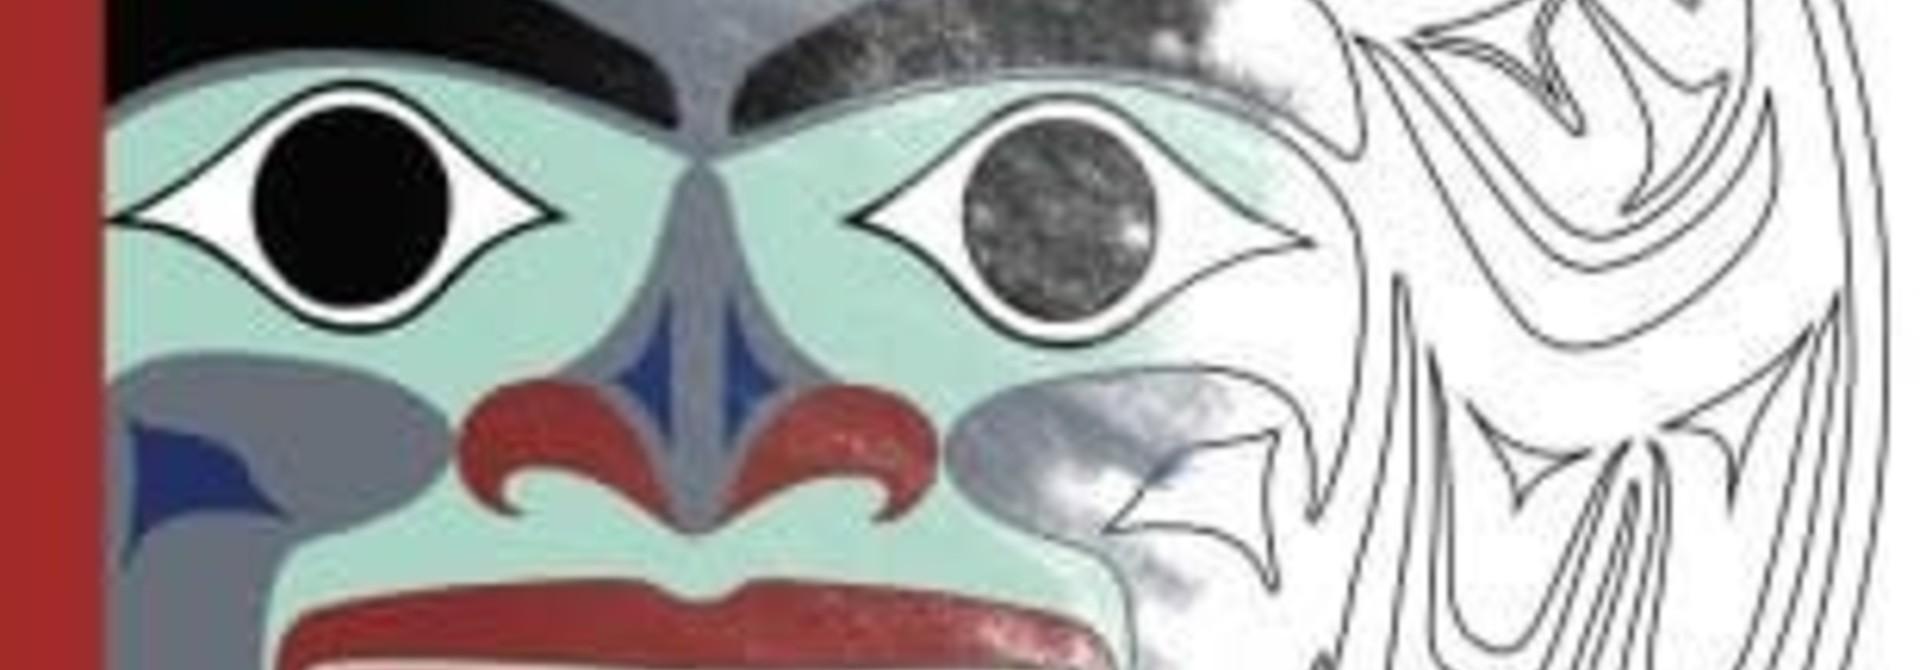 Colouring Book-Clarence Mills-Haida